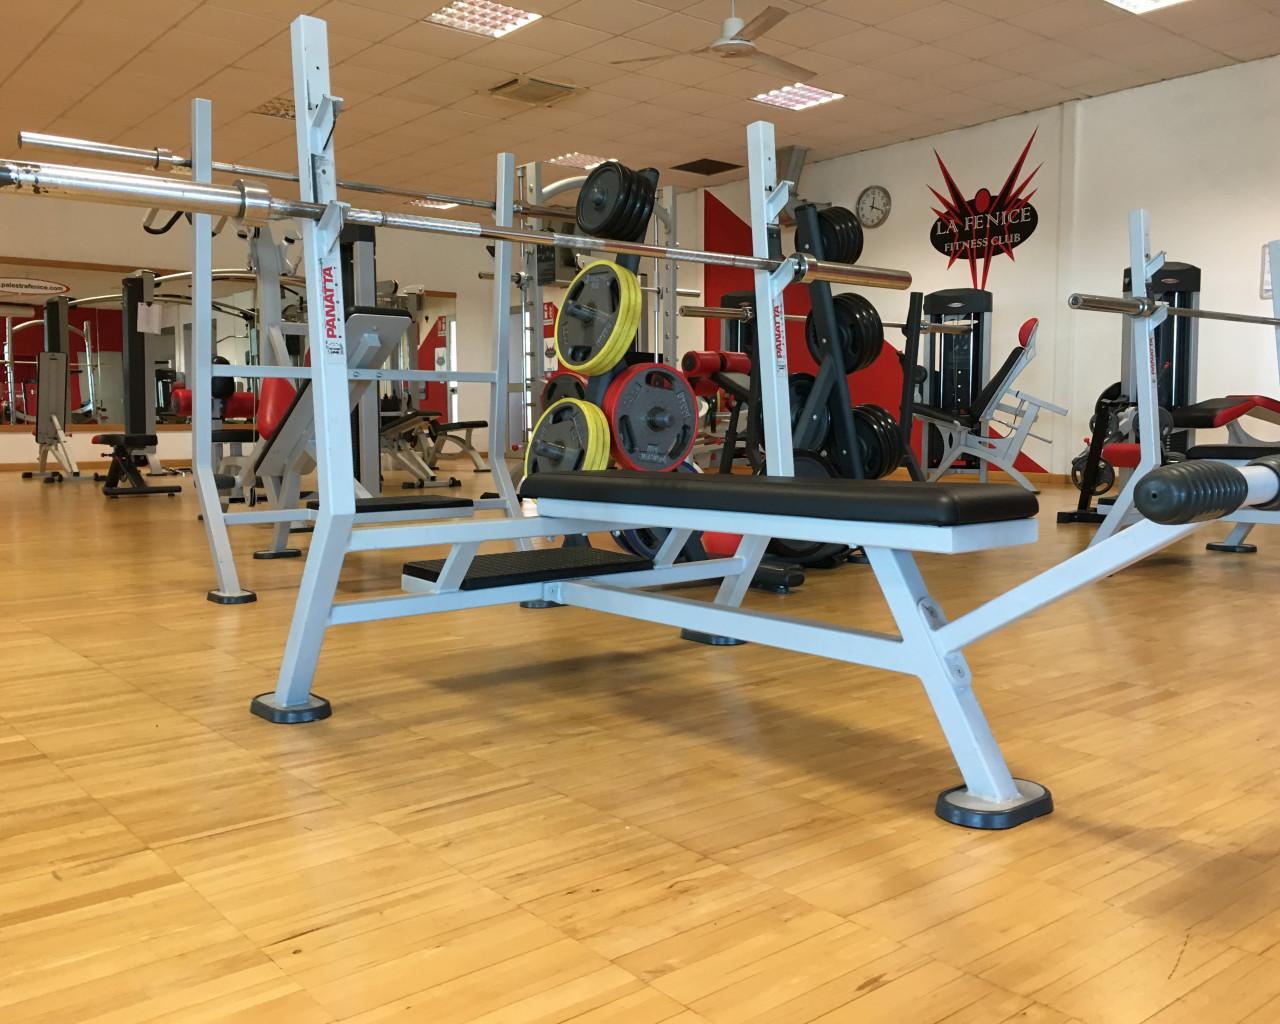 La Fenice Fitness Club